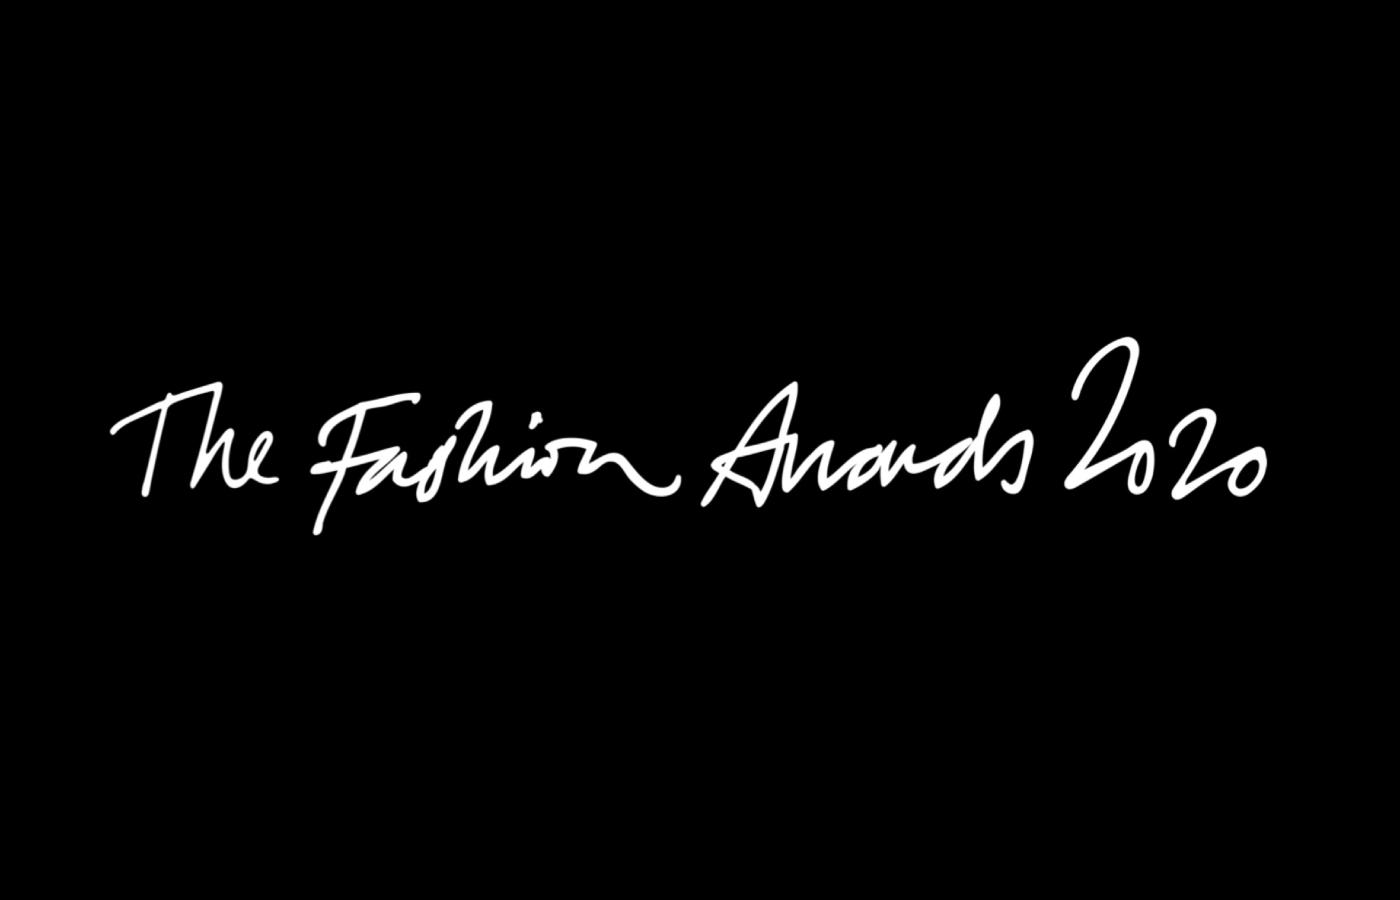 The Fashion Awards 2020